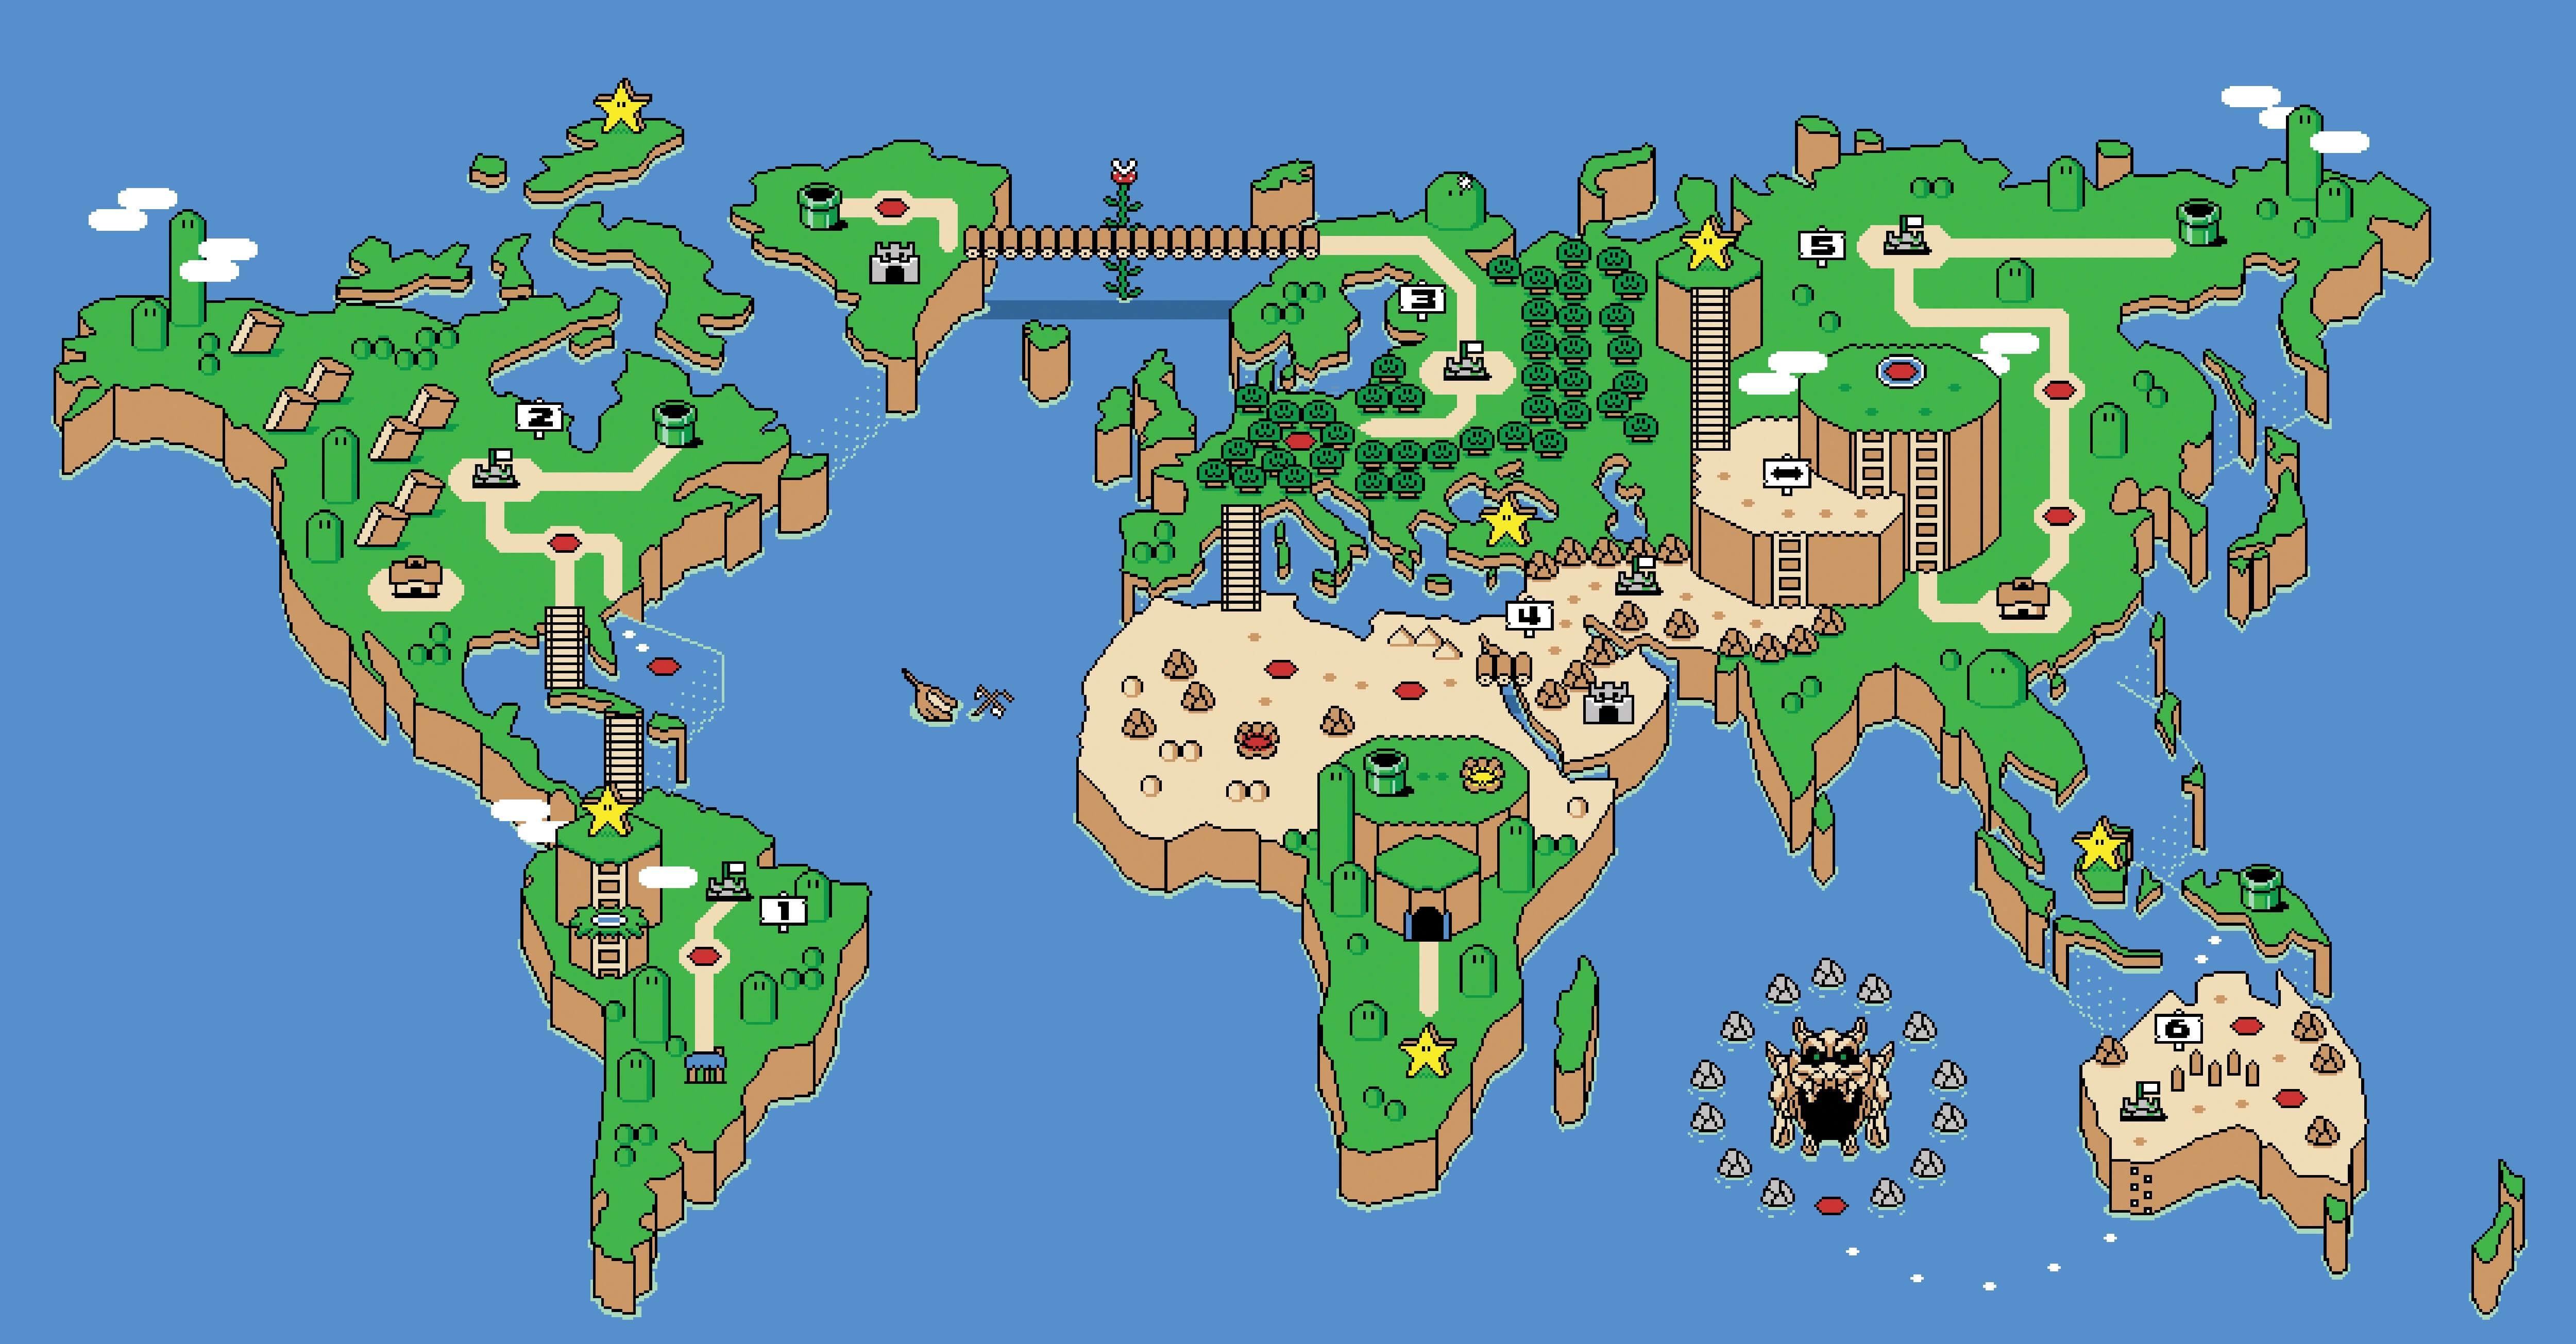 super mario world map all levels Super Mario World Map Wallpapers Wallpaper Cave